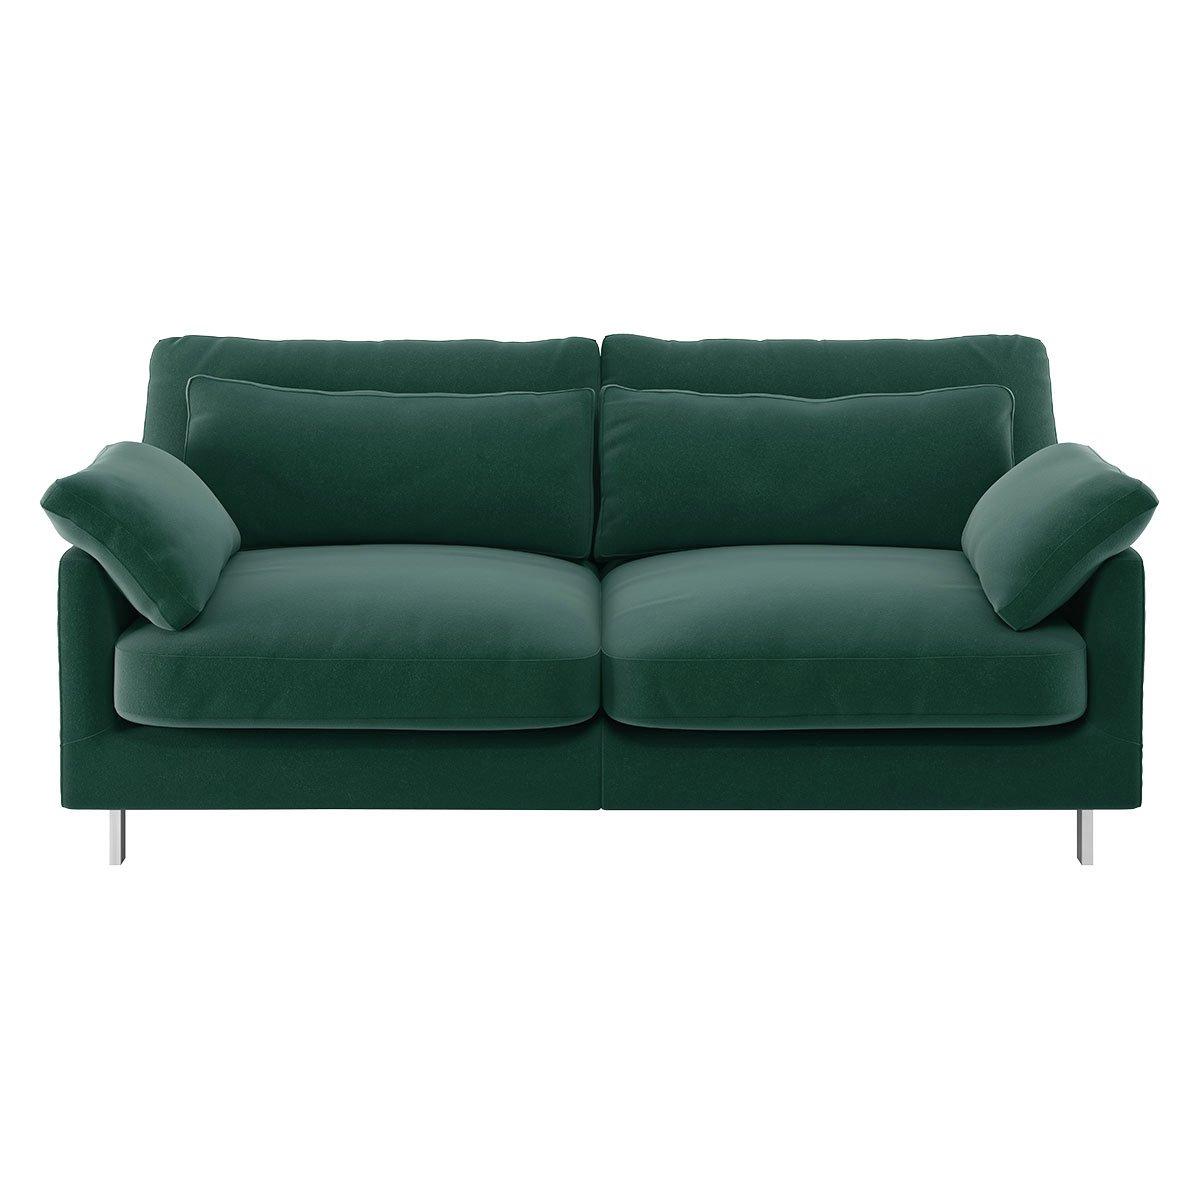 Habitat Cuscino 2 Seater Velvet Sofa - Emerald Green